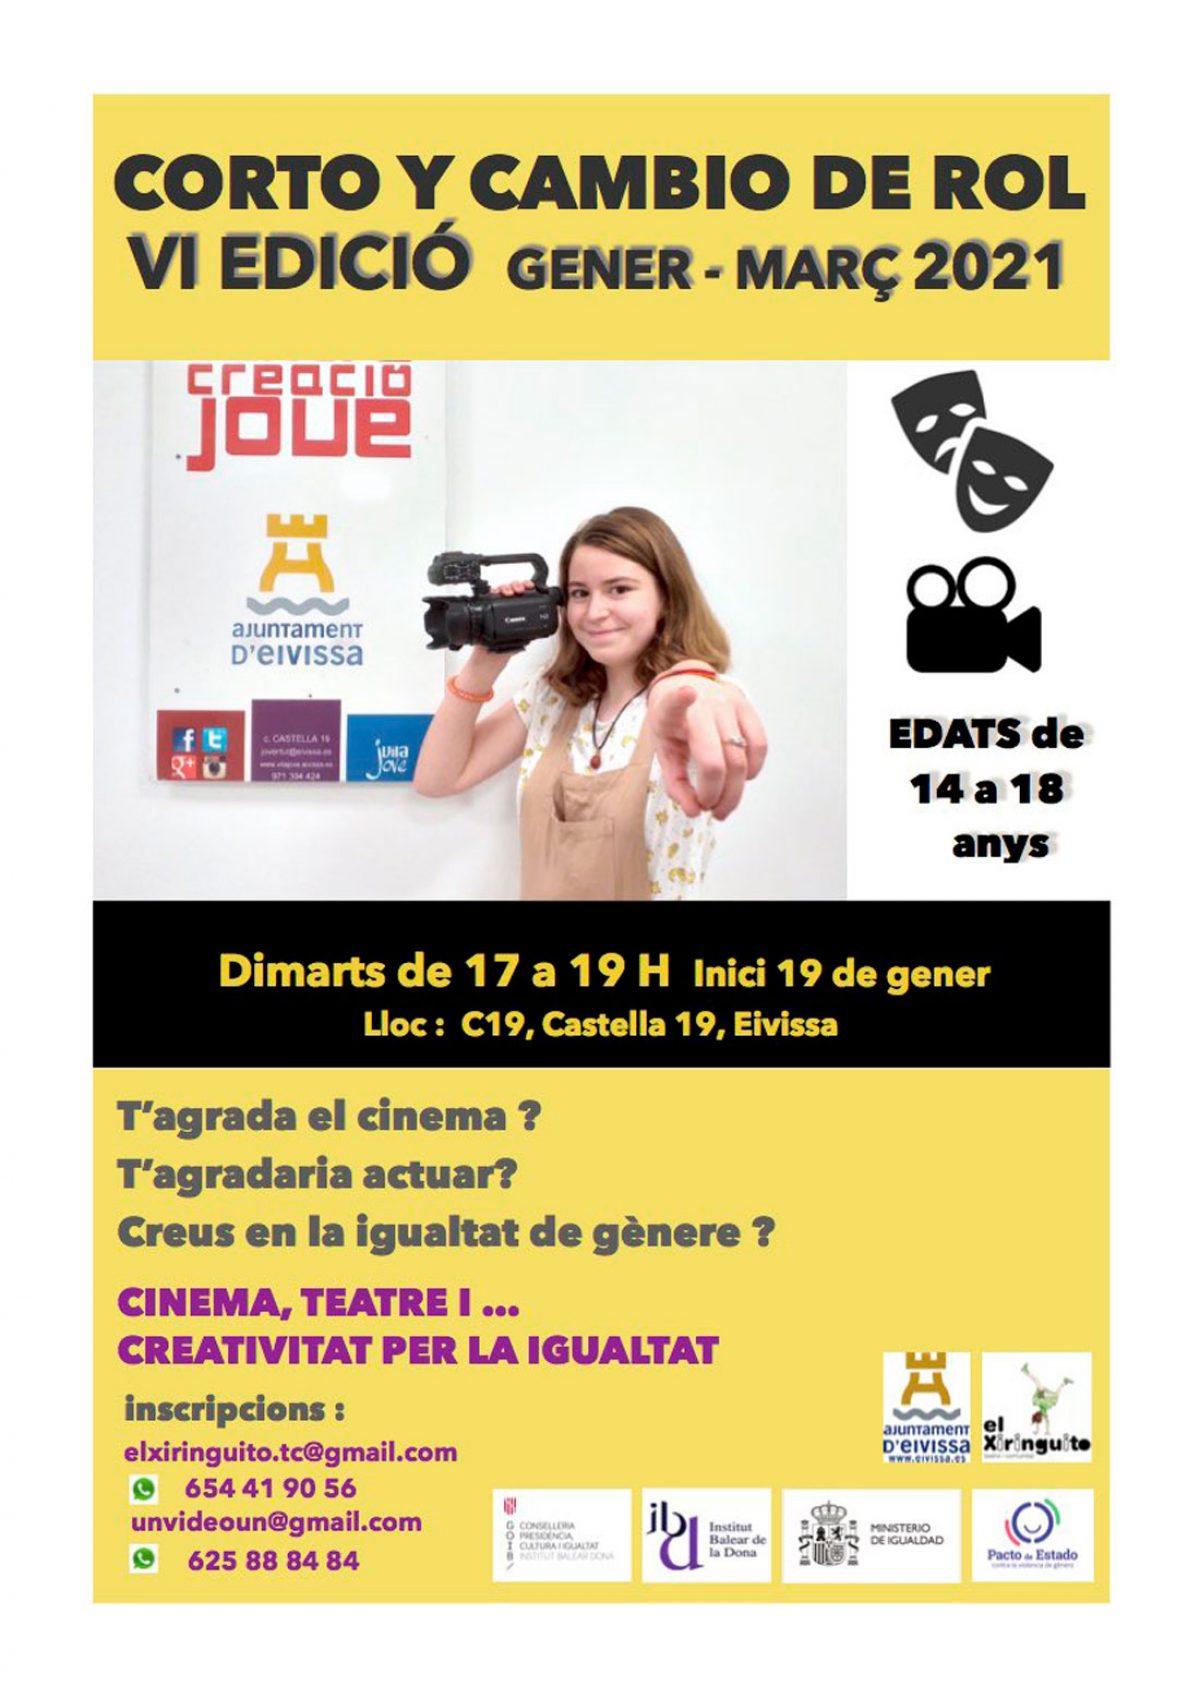 short-and-role-change-shorts-ibiza-2021-welcometoibiza